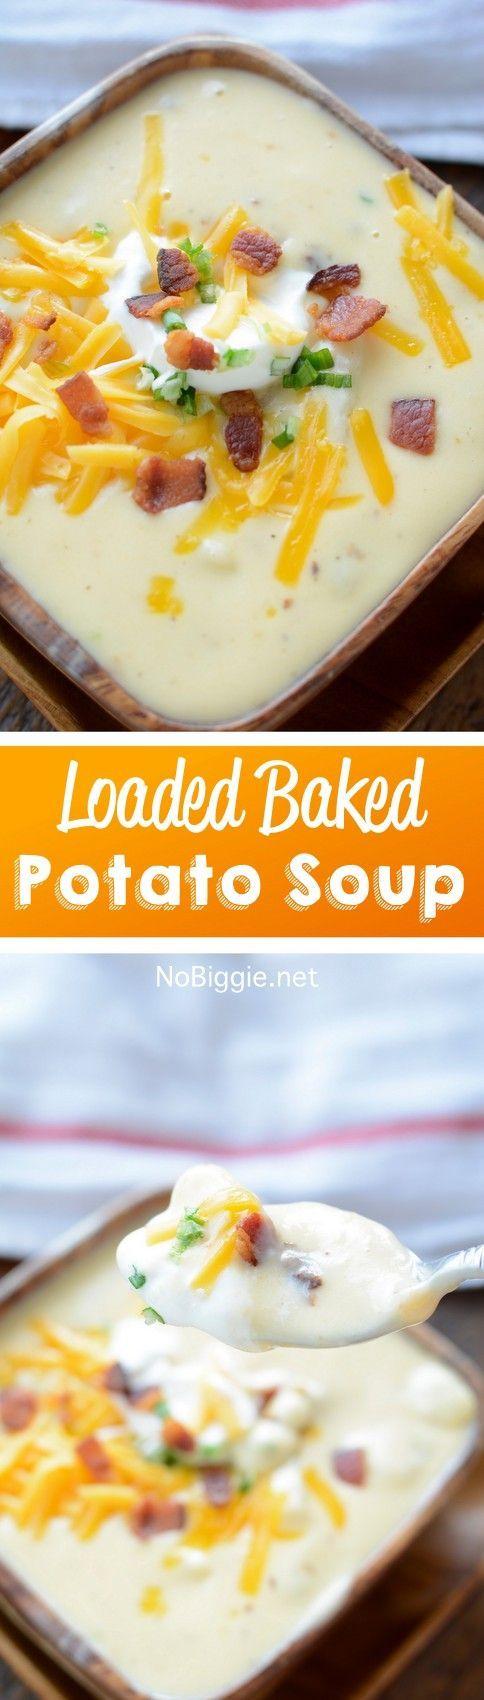 loaded baked potato soup recipe | NoBiggie.net